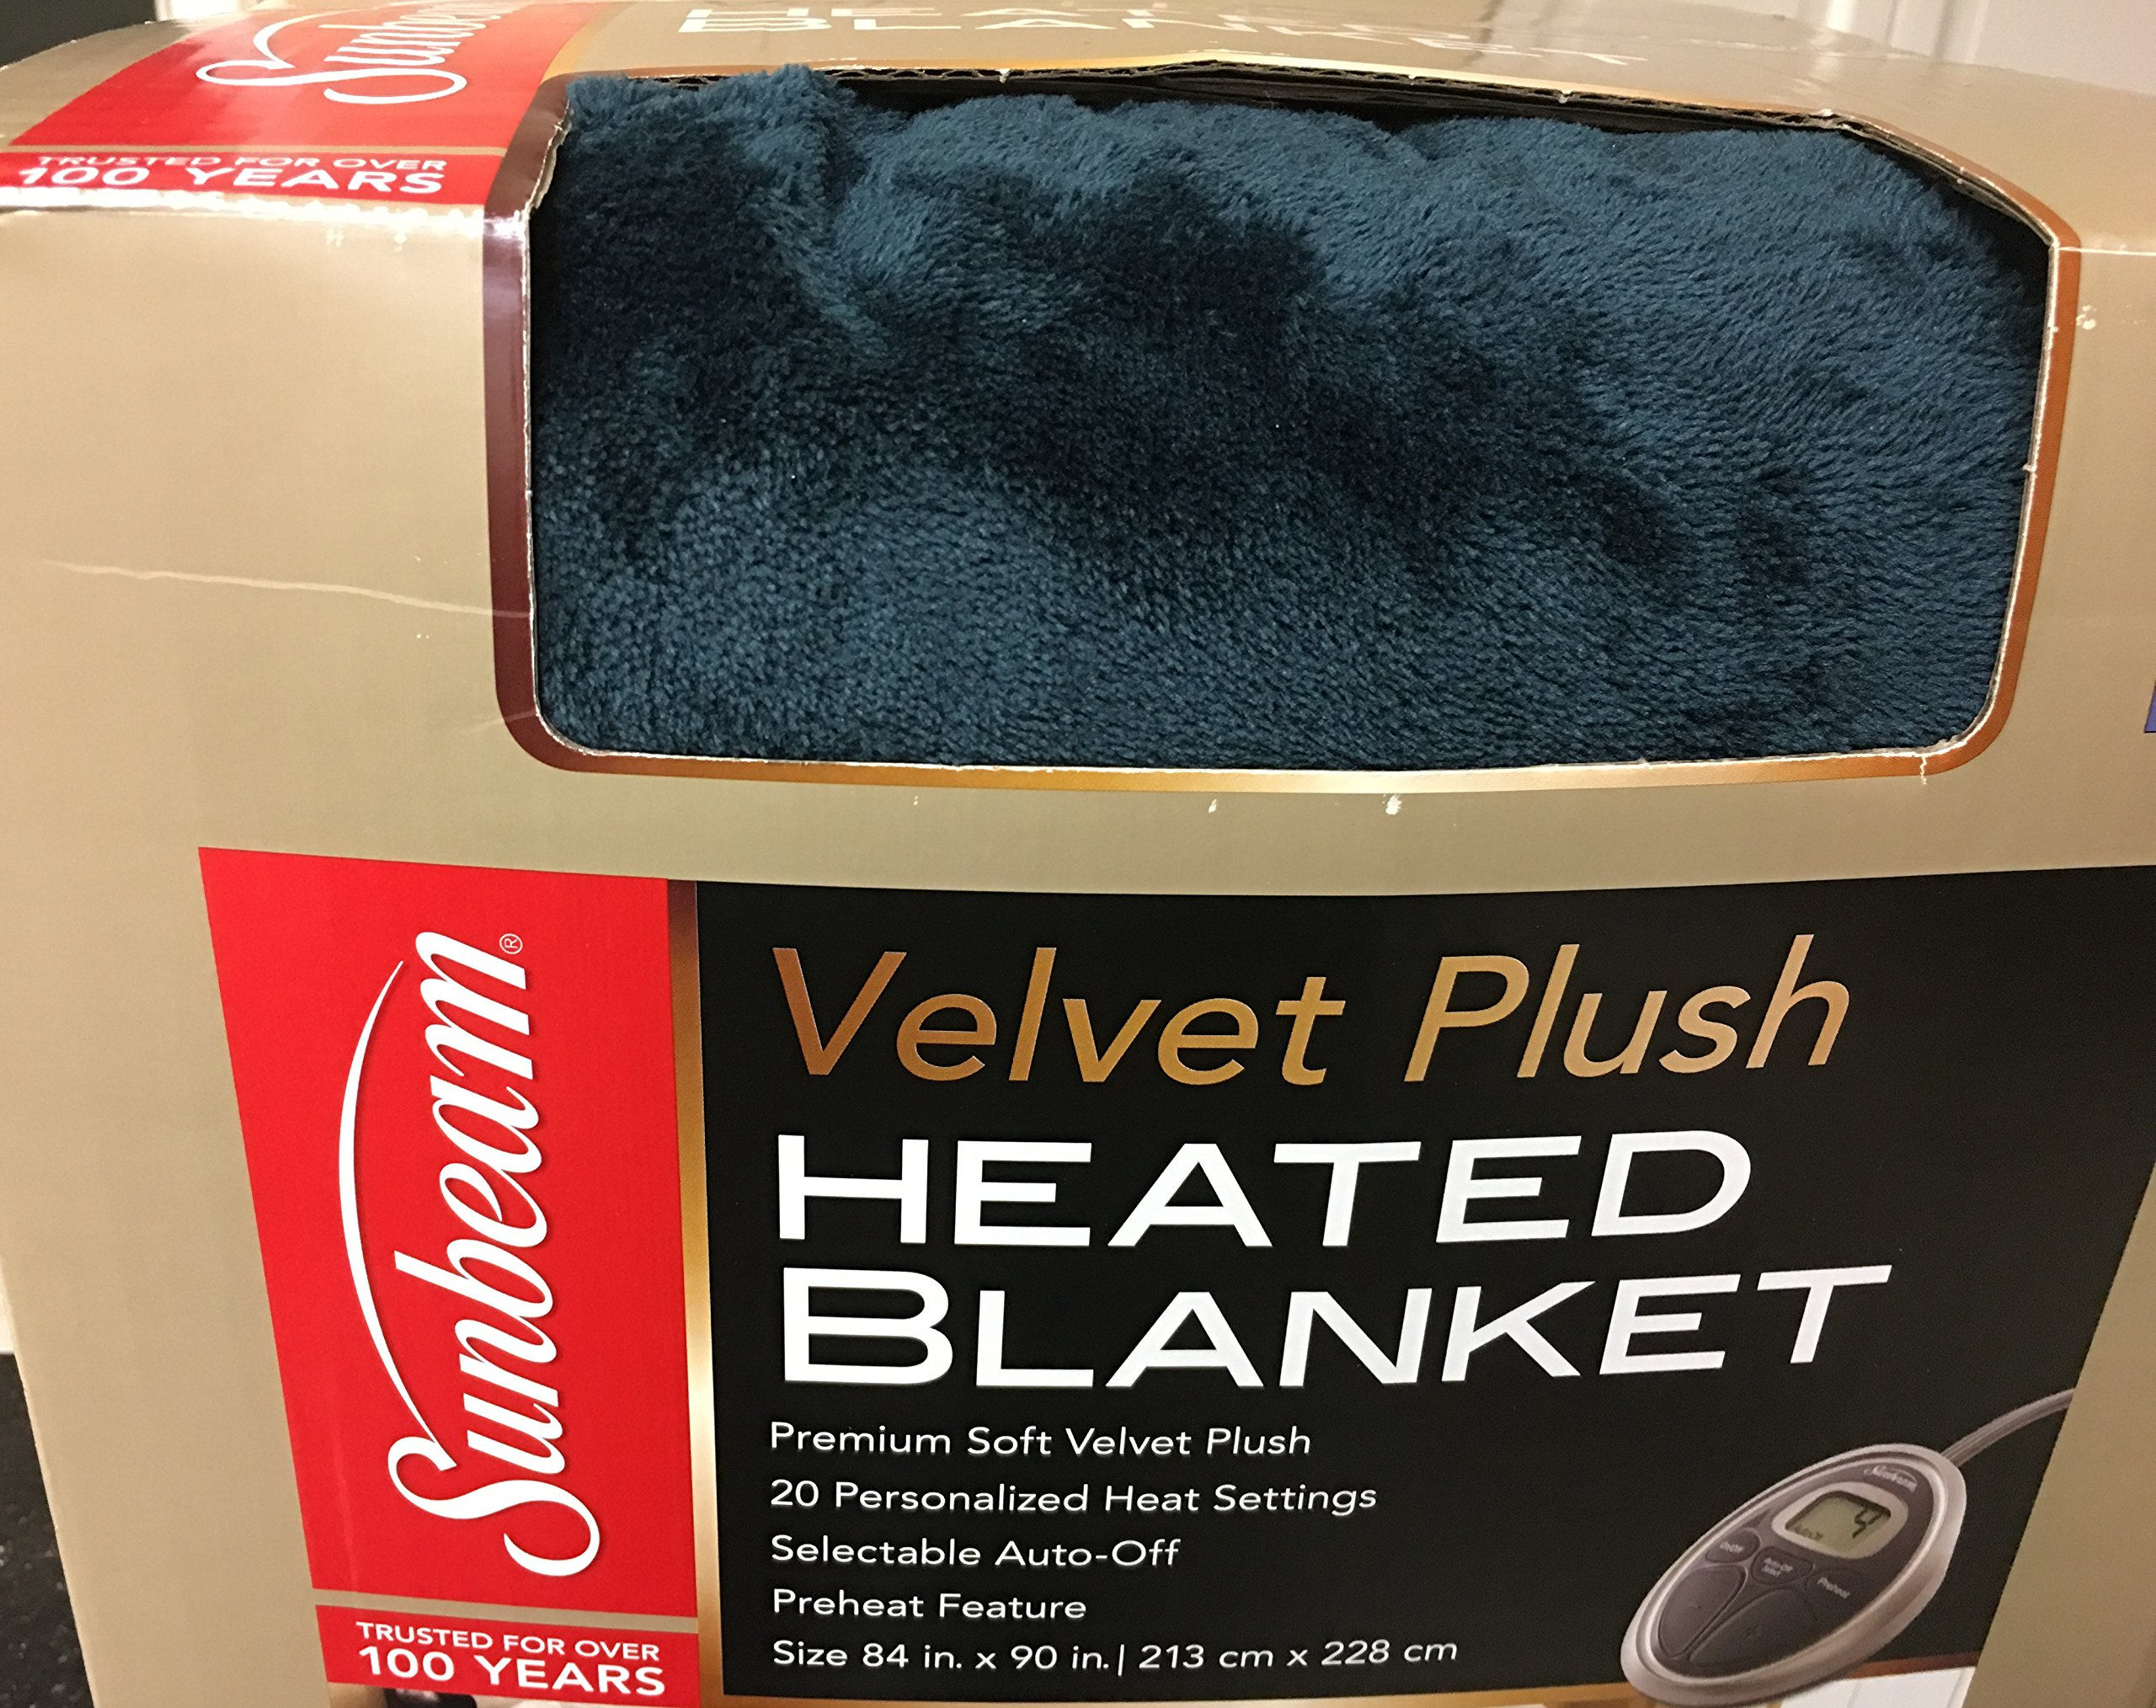 Sunbeam Luxurious Premium Plush Electric Heated Blanket, Auto Shut-off 20 Heat Settings Two Controllers, Queen Size, Deep Sea Blue